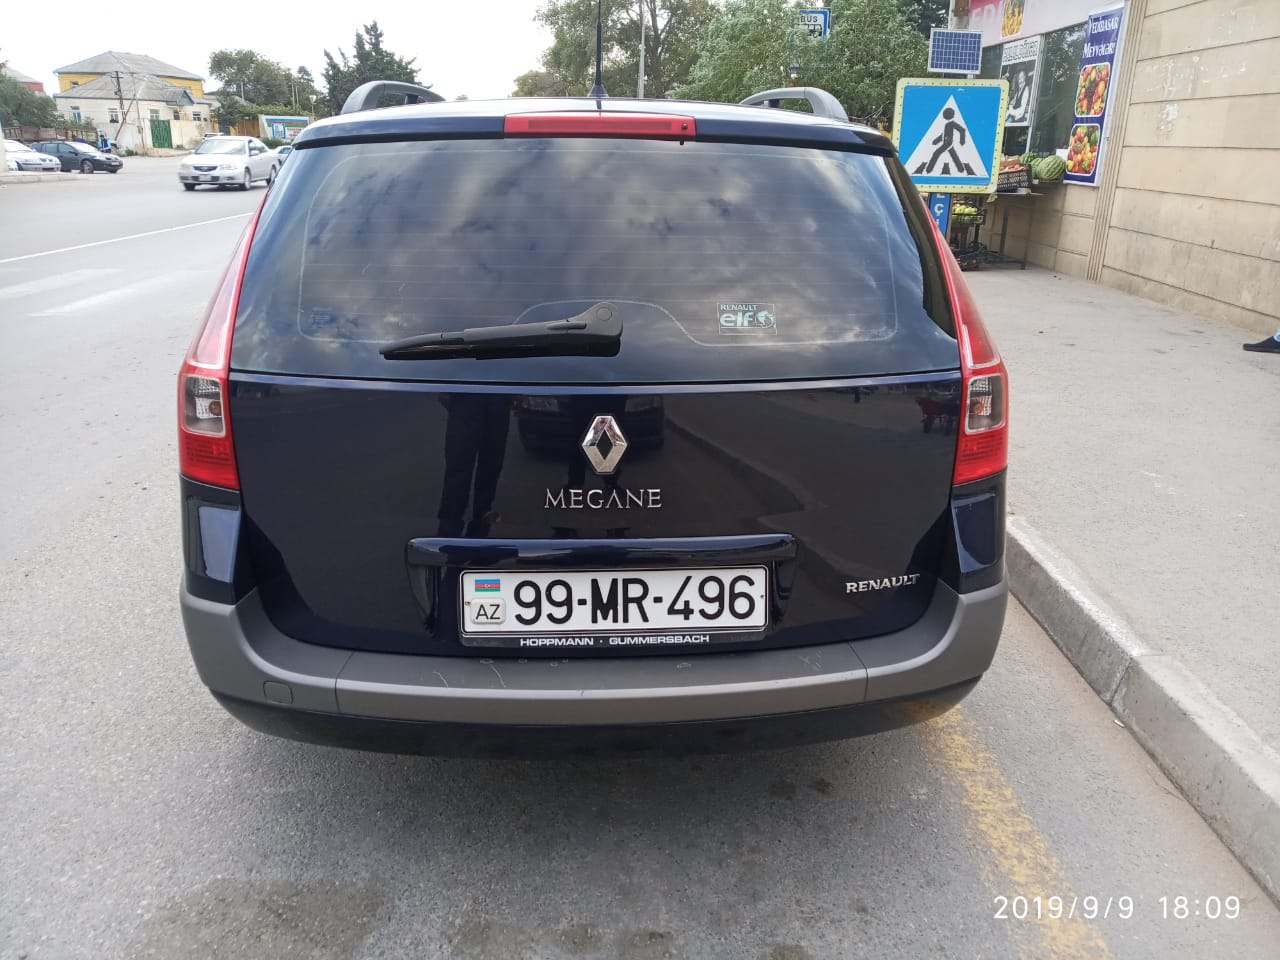 Renault Megane 1.5(lt) 2007 İkinci əl  $6700